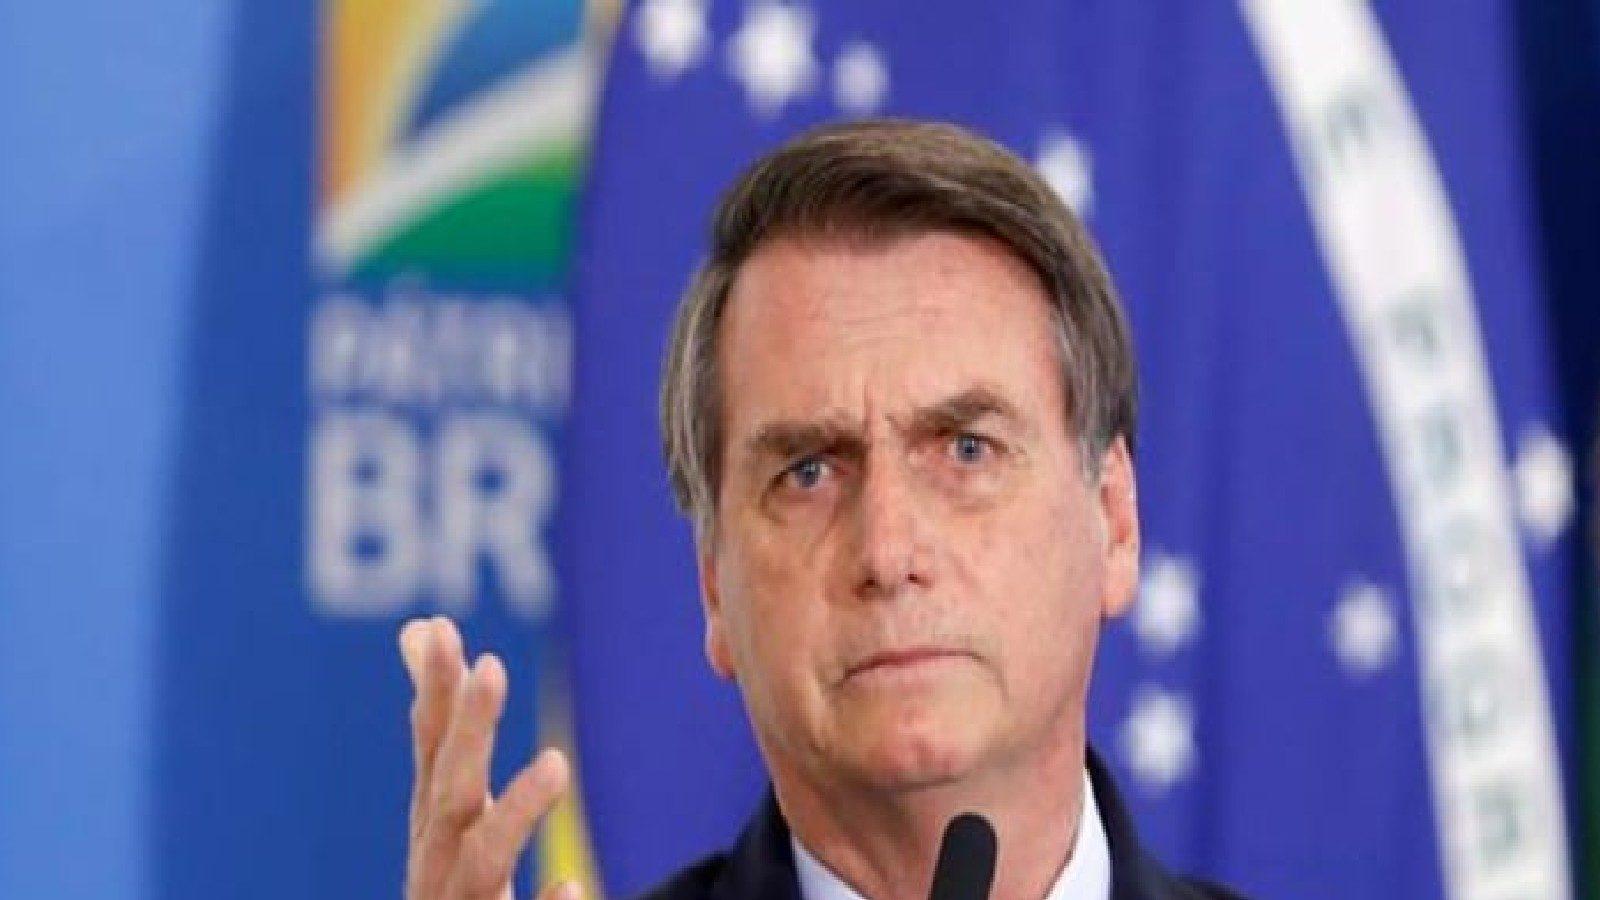 Brazil president jair bolsonaro decided to not get vaccinated coronavirus – ब्राजील के राष्ट्रपति नहीं लगवाएंगे वैक्सीन, कहा